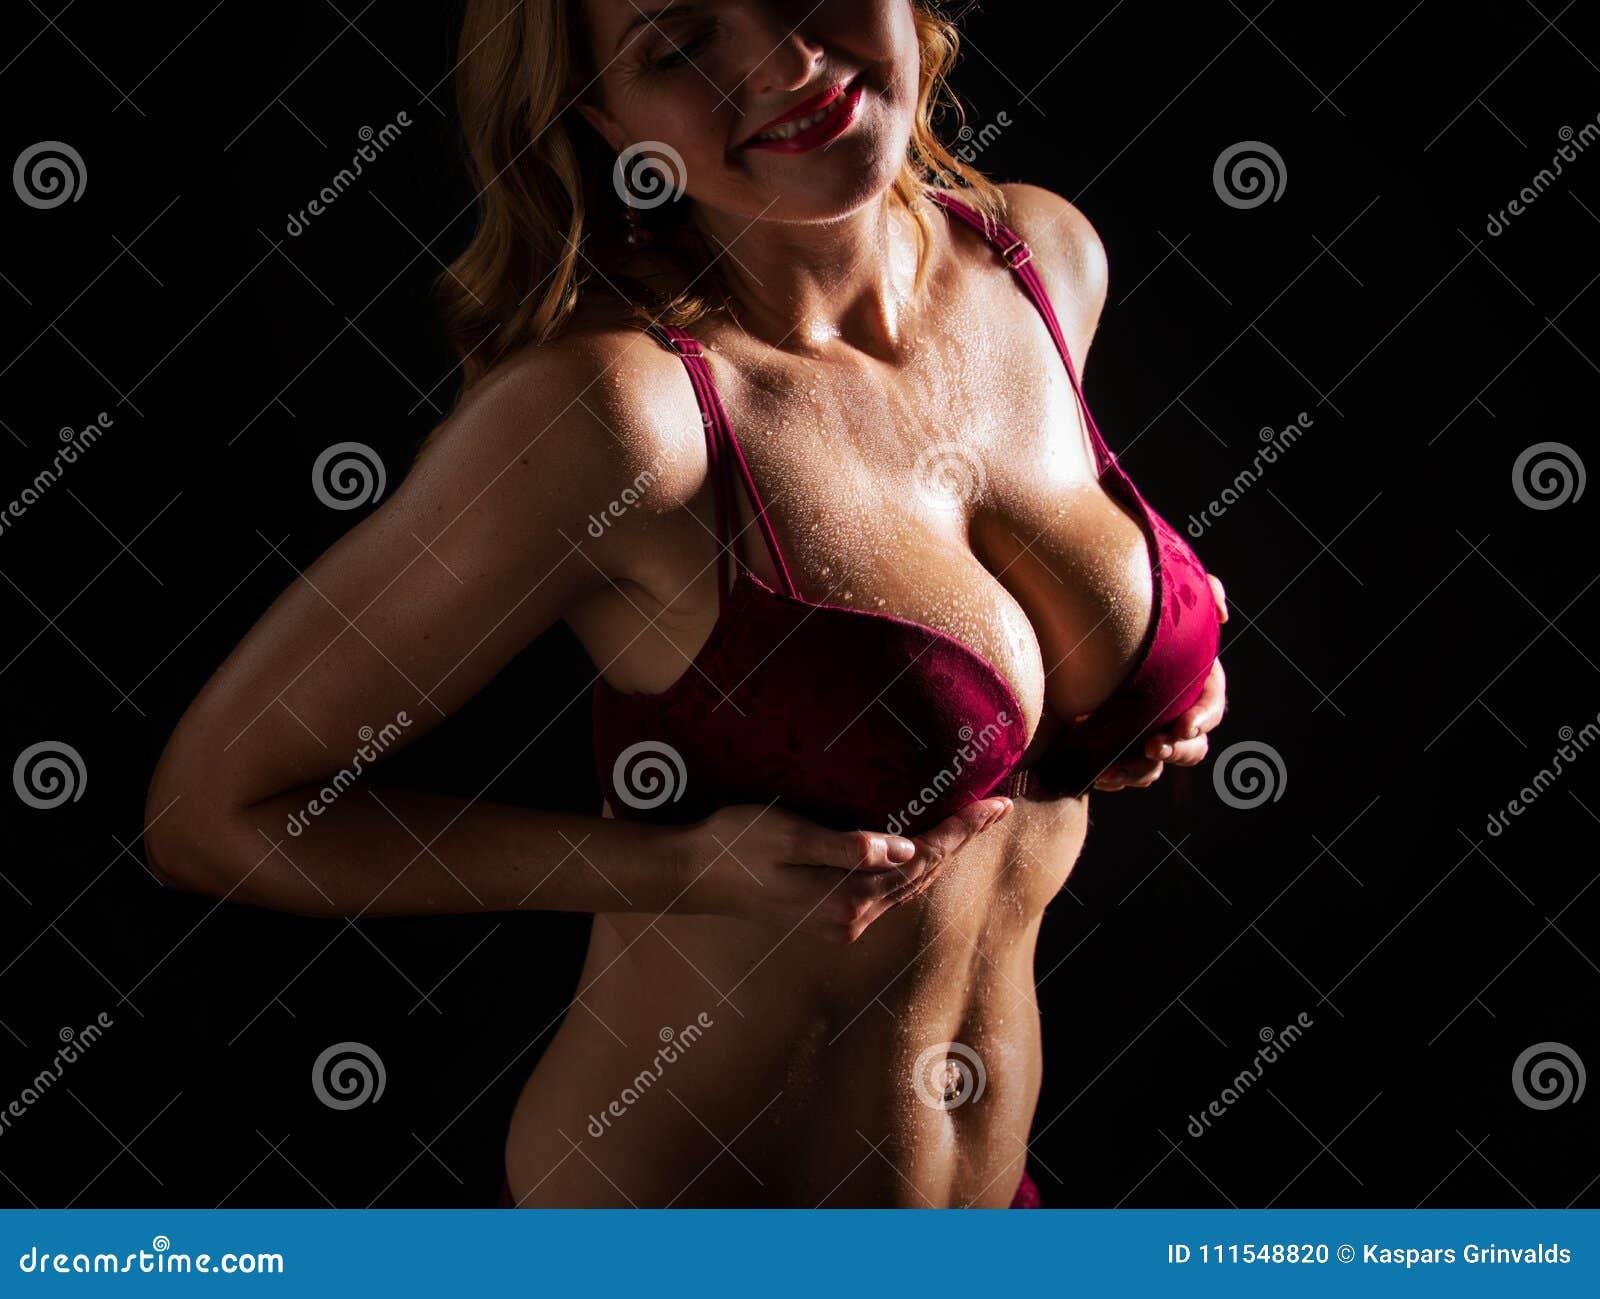 Girl with big tits bra Wife Big Tits Wearing Lingerie Niche Top Mature